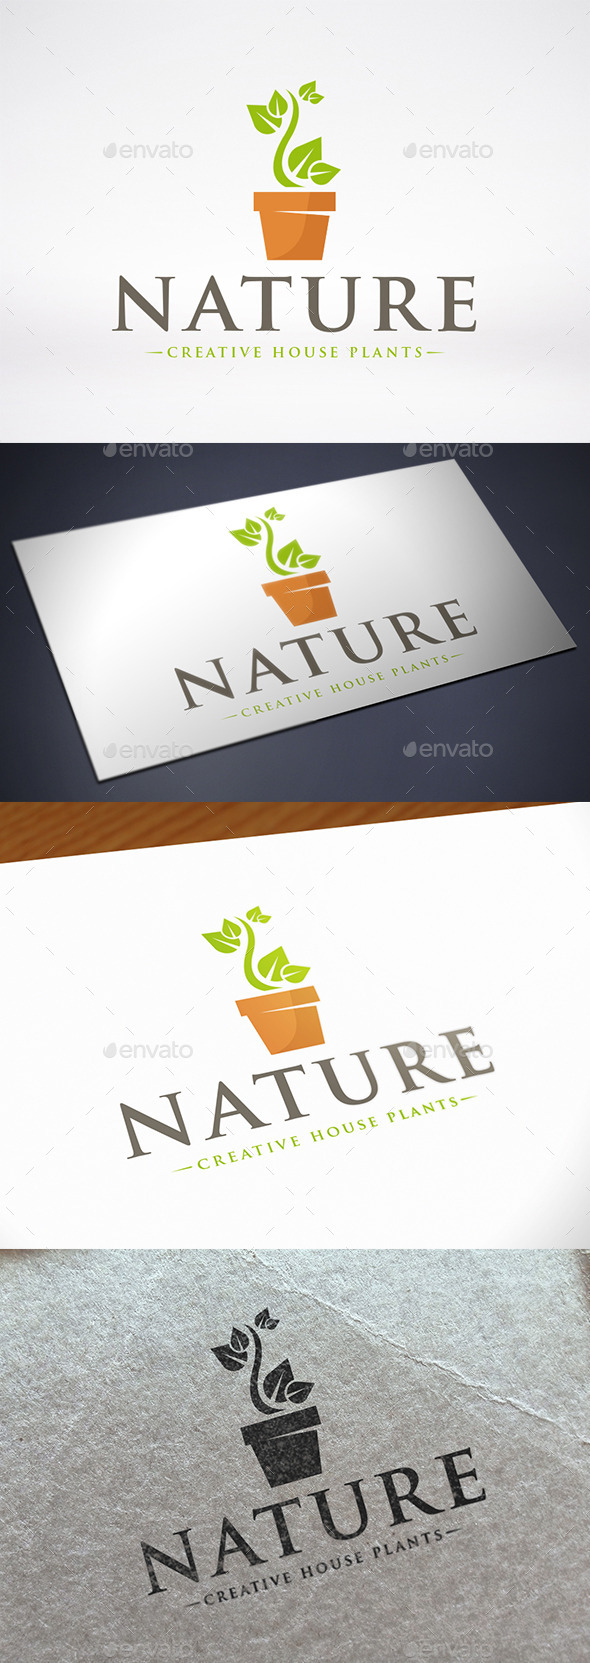 Decorative Flower Logo Template - Nature Logo Templates